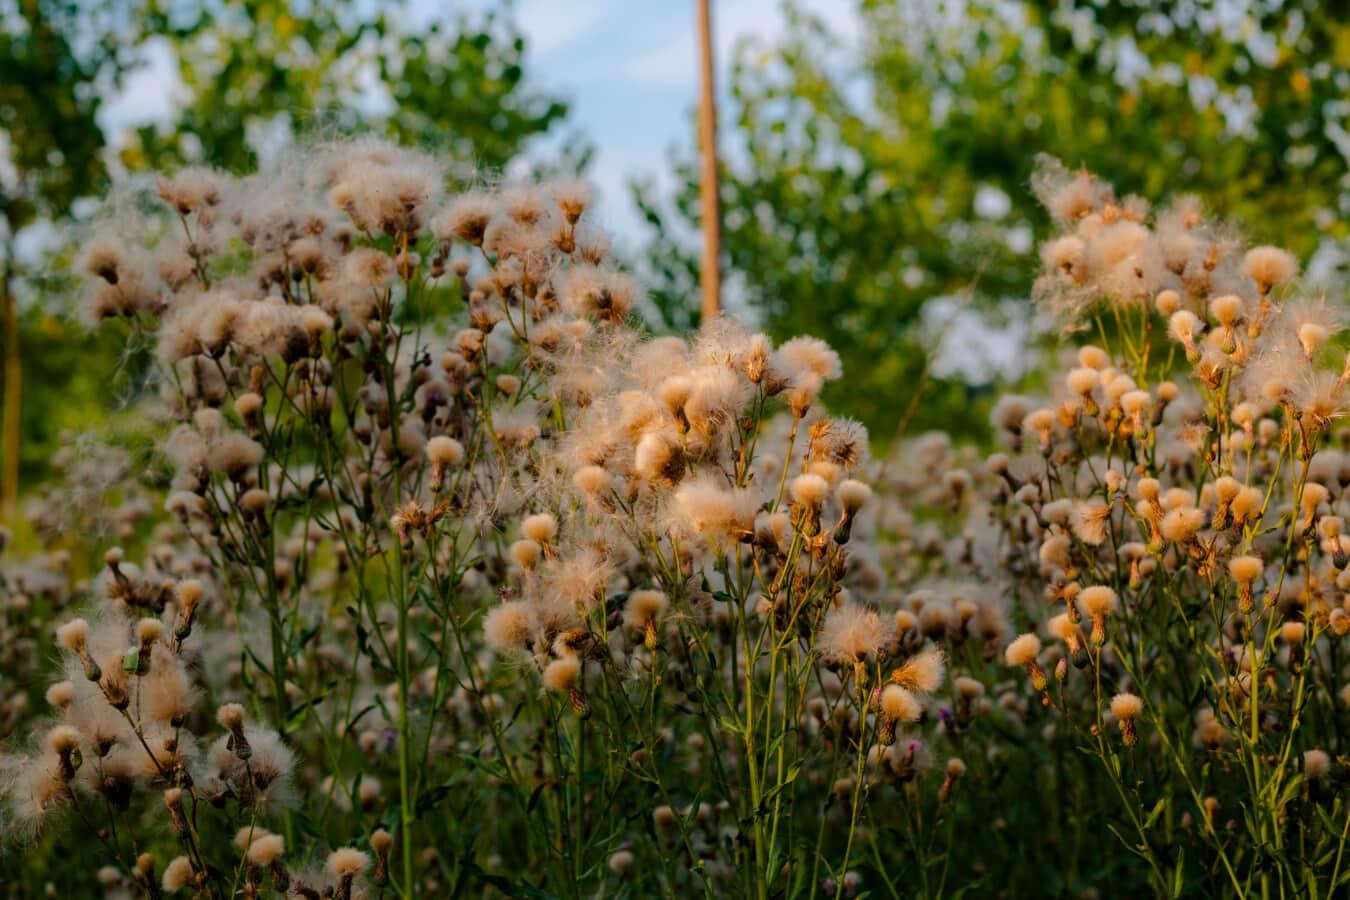 cotton grass, grassy, weed, flower, fair weather, nature, plant, tree, grass, summer